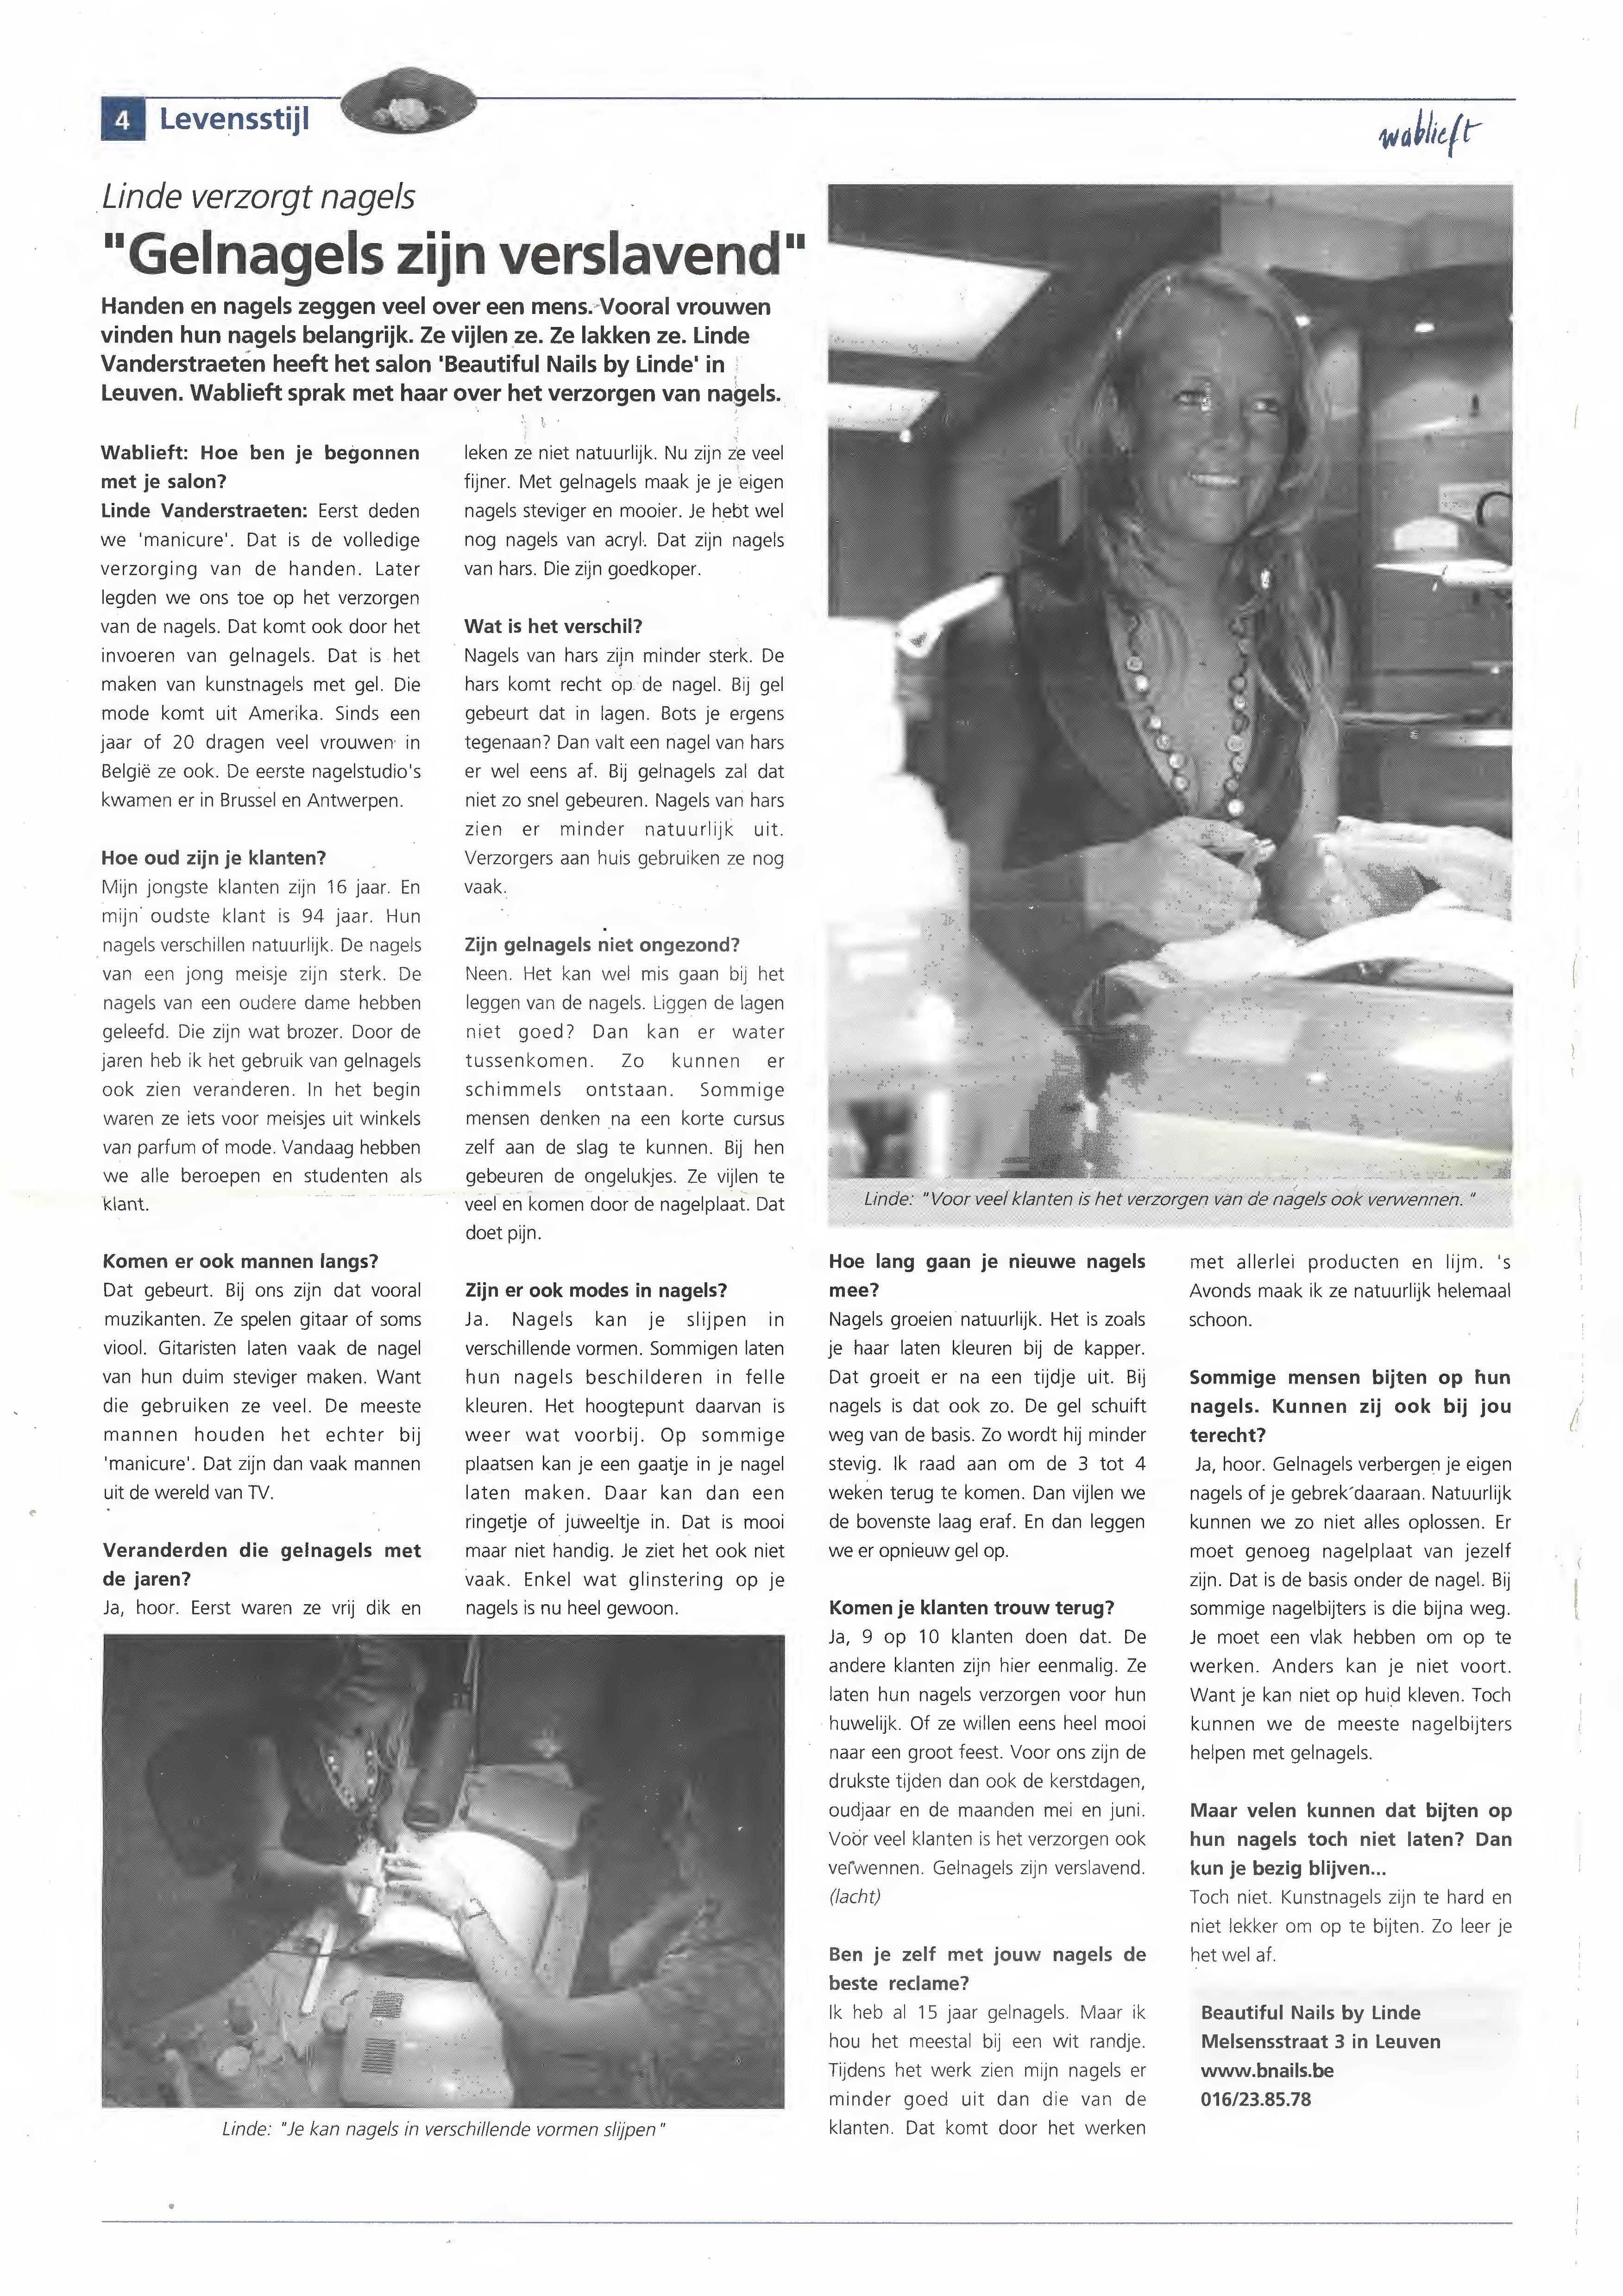 Nagelstudio Beautiful Nails by Linde (Leuven) - Interview Wablieft